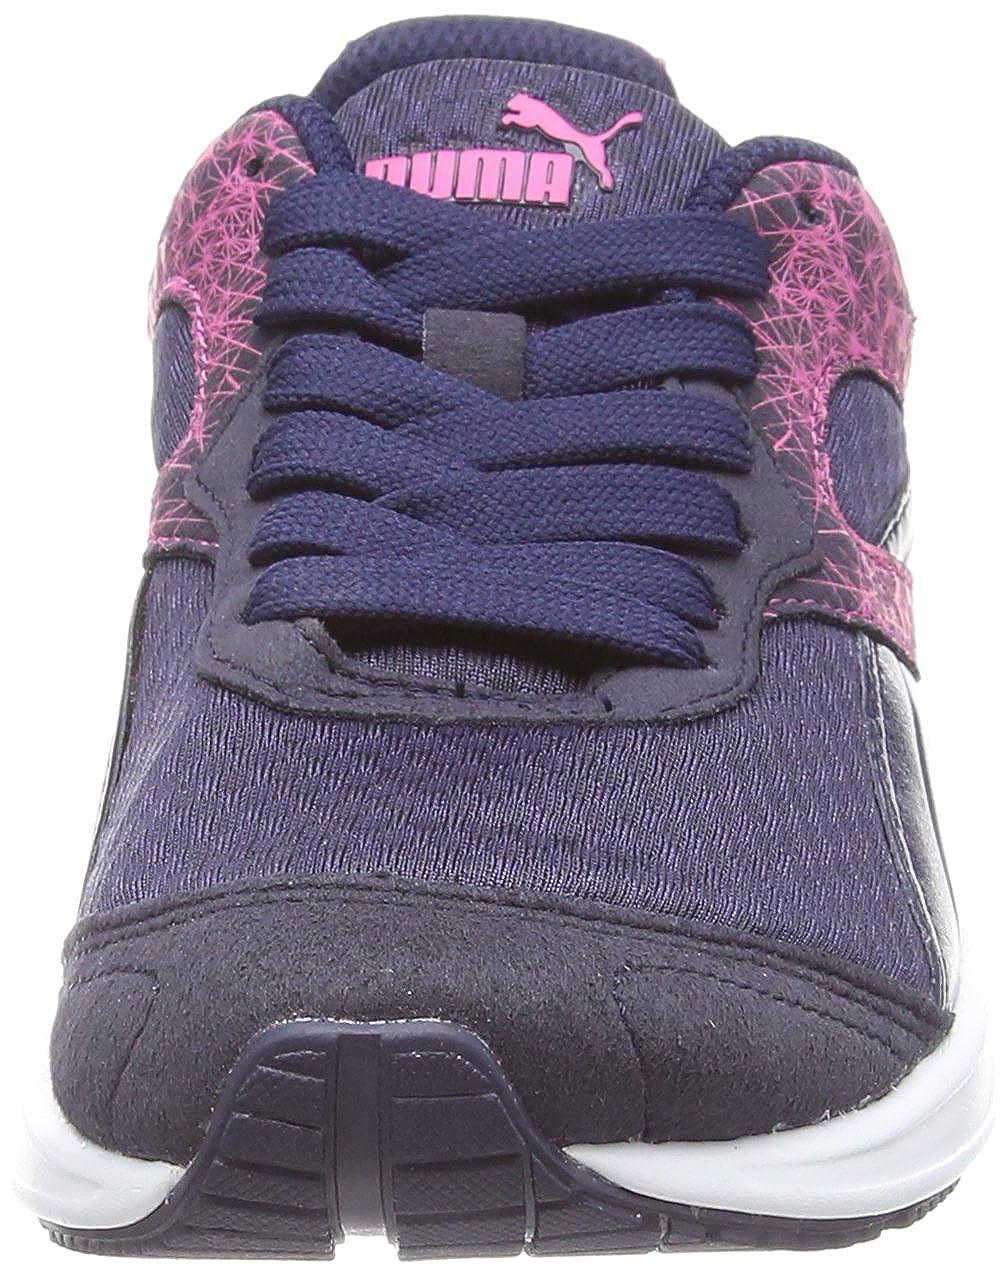 timeless design 1edc5 37365 Puma Ftr Tf Racer Fracture, Unisex Adults  Training Running Shoes, Pink ( Peacoat Carmine Rose), 7.5 UK (41 EU)  Amazon.co.uk  Shoes   Bags